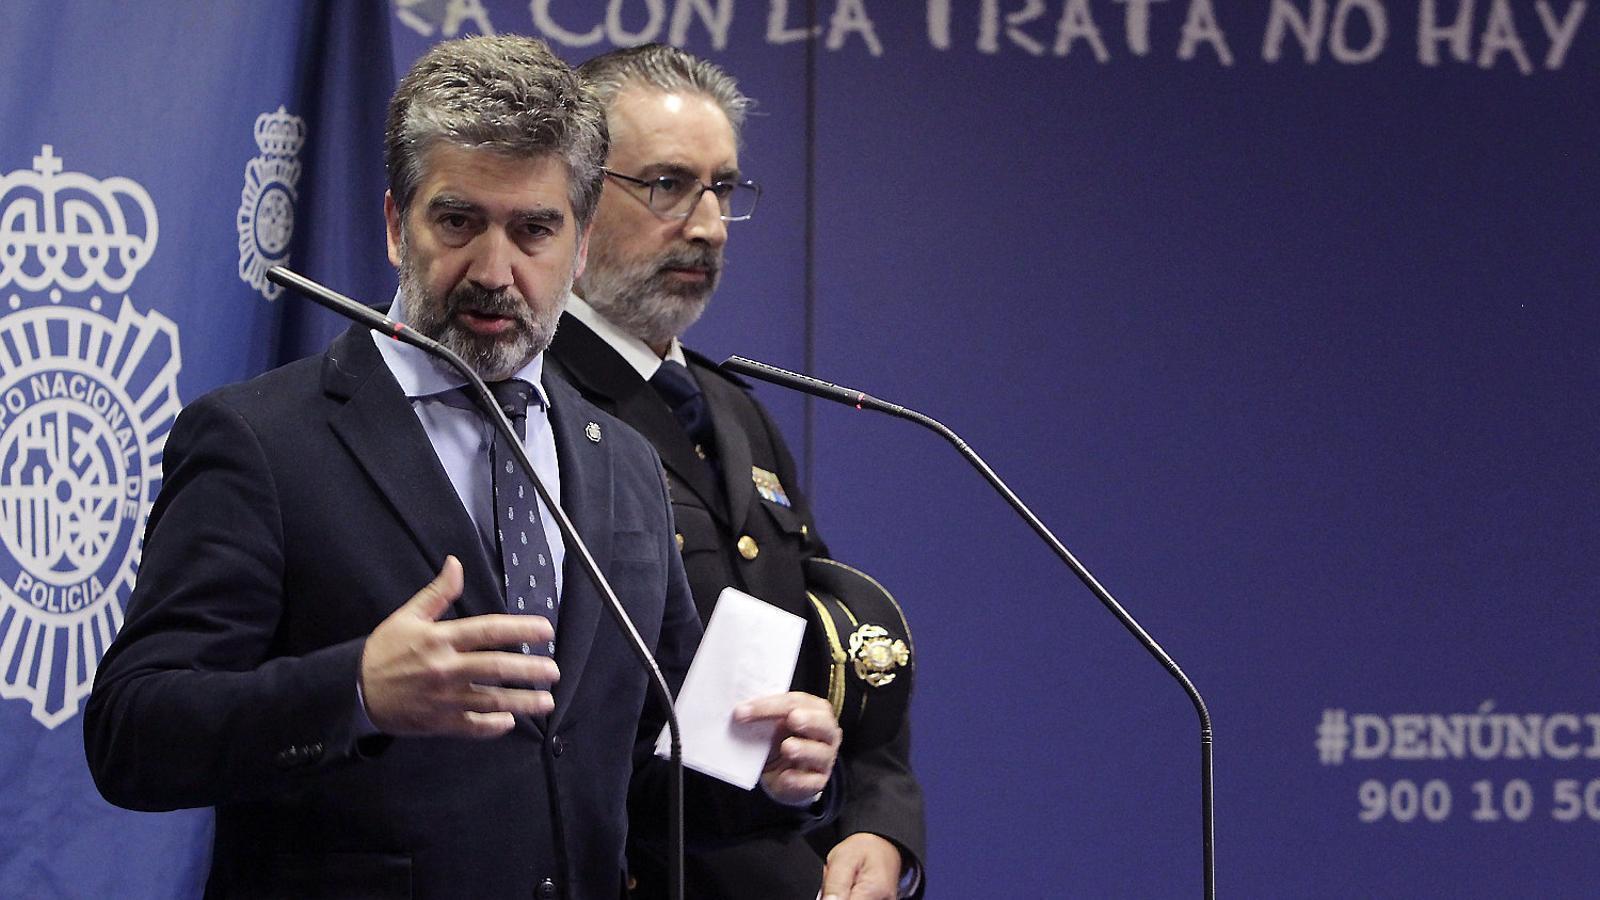 Ignacio Cosidó en una imatge de la seva època policial.